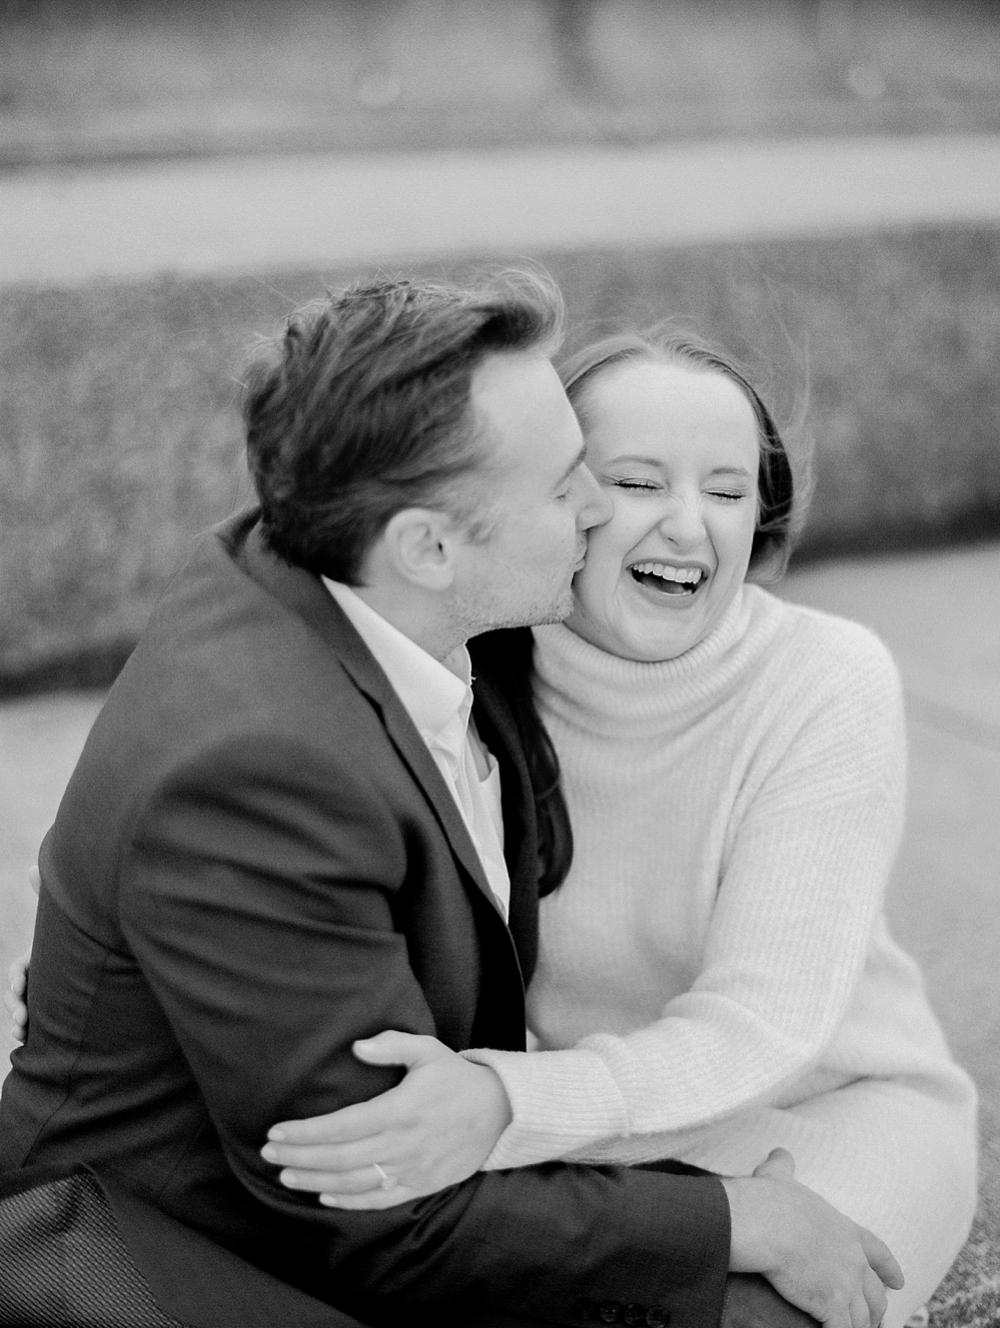 kristin-la-voie-photography-chicago-Wedding-Photographer-museum-campus-adler-planetarium-engagement-43